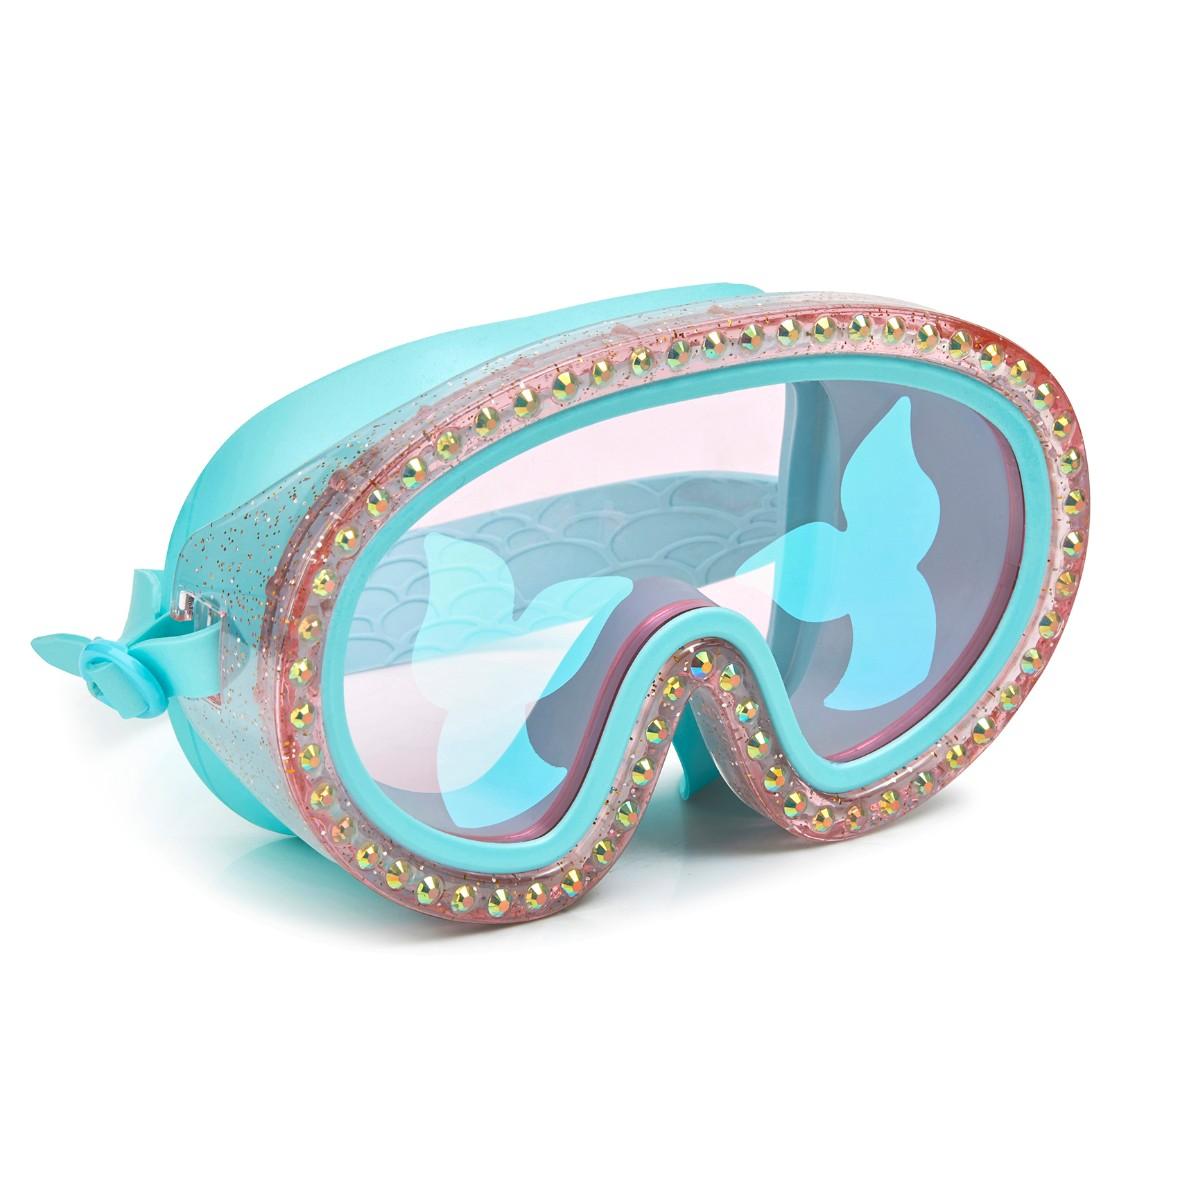 Bling2o - Swim Mask, Mermaid (600256)